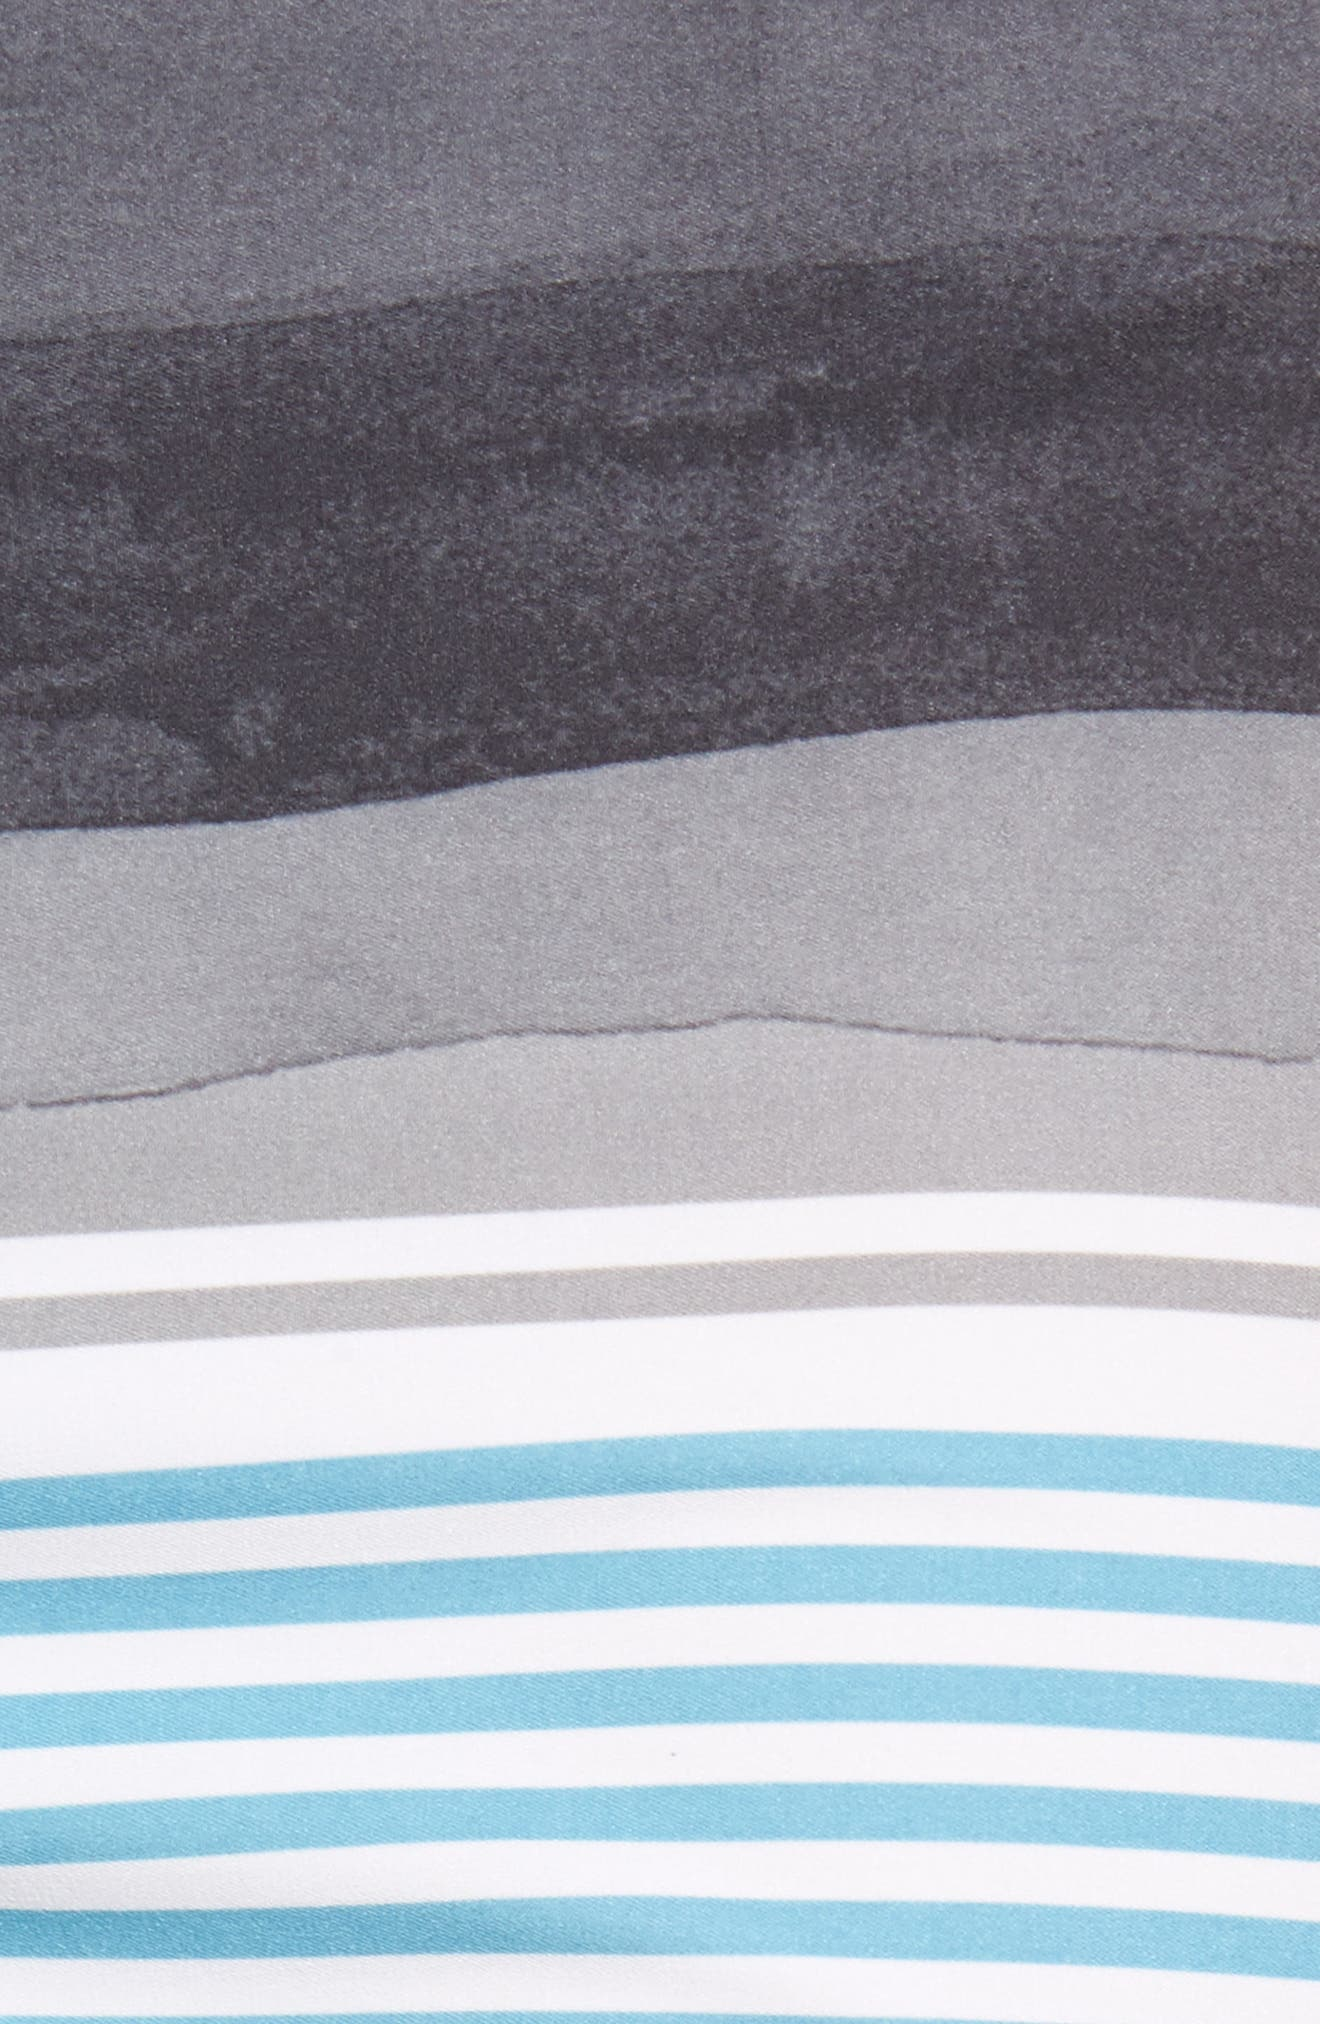 Hyperfreak Heist Board Shorts,                             Alternate thumbnail 37, color,